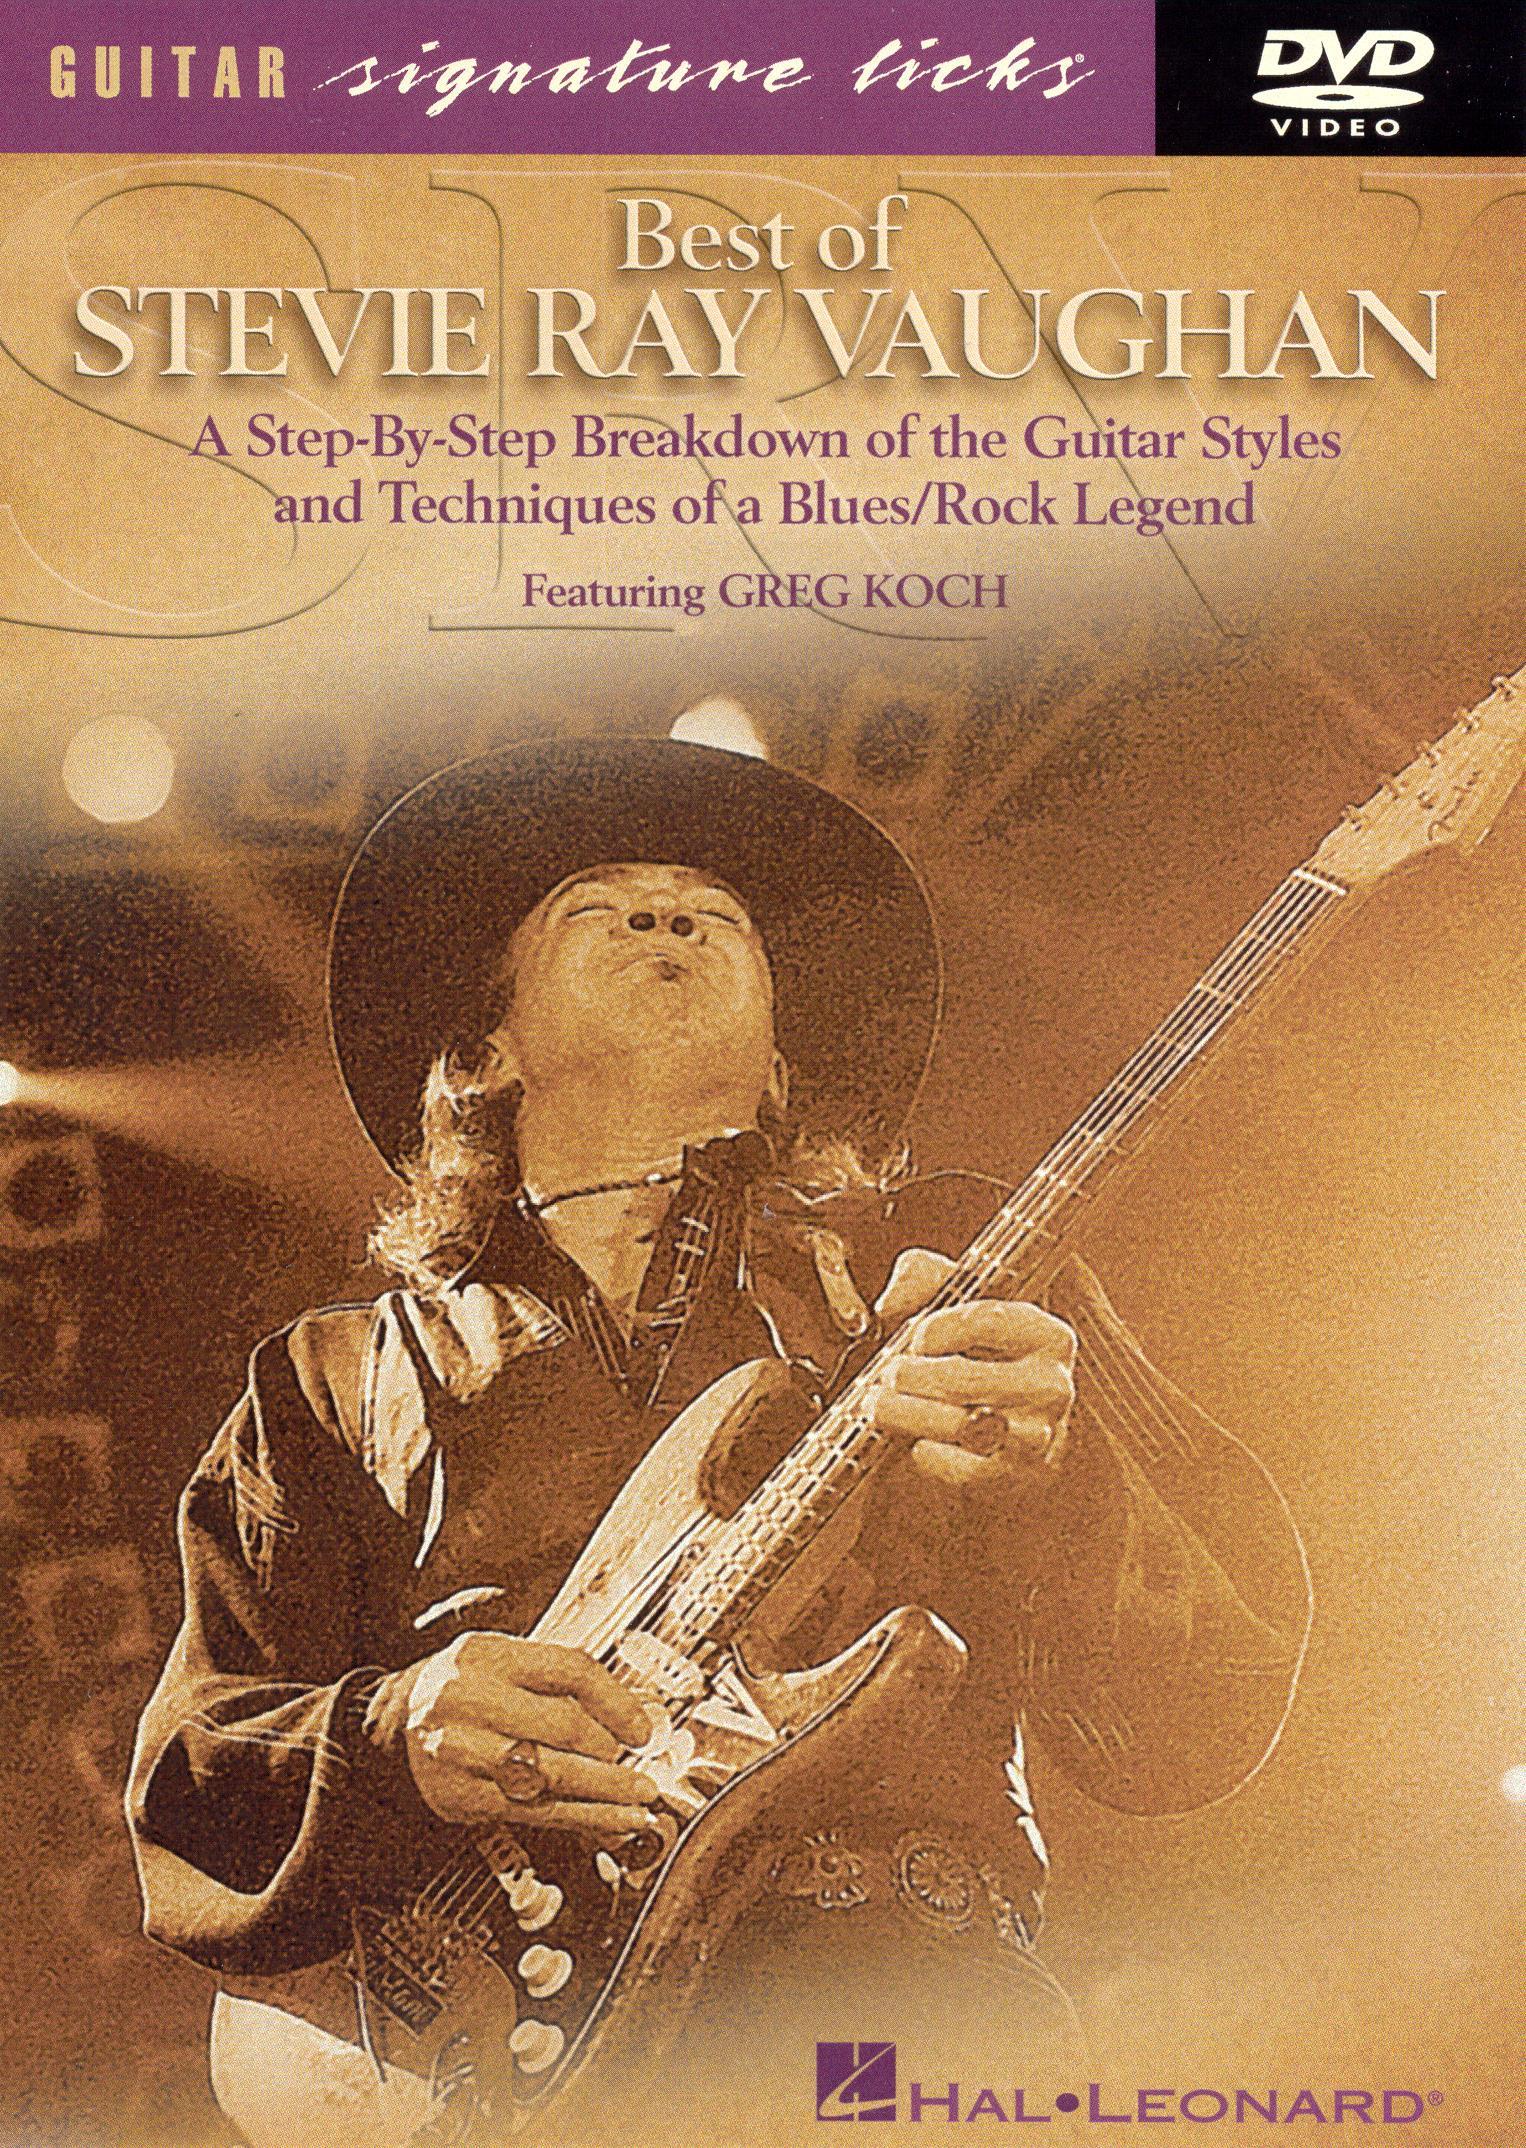 Guitar Signature Licks: Best of Stevie Ray Vaughan